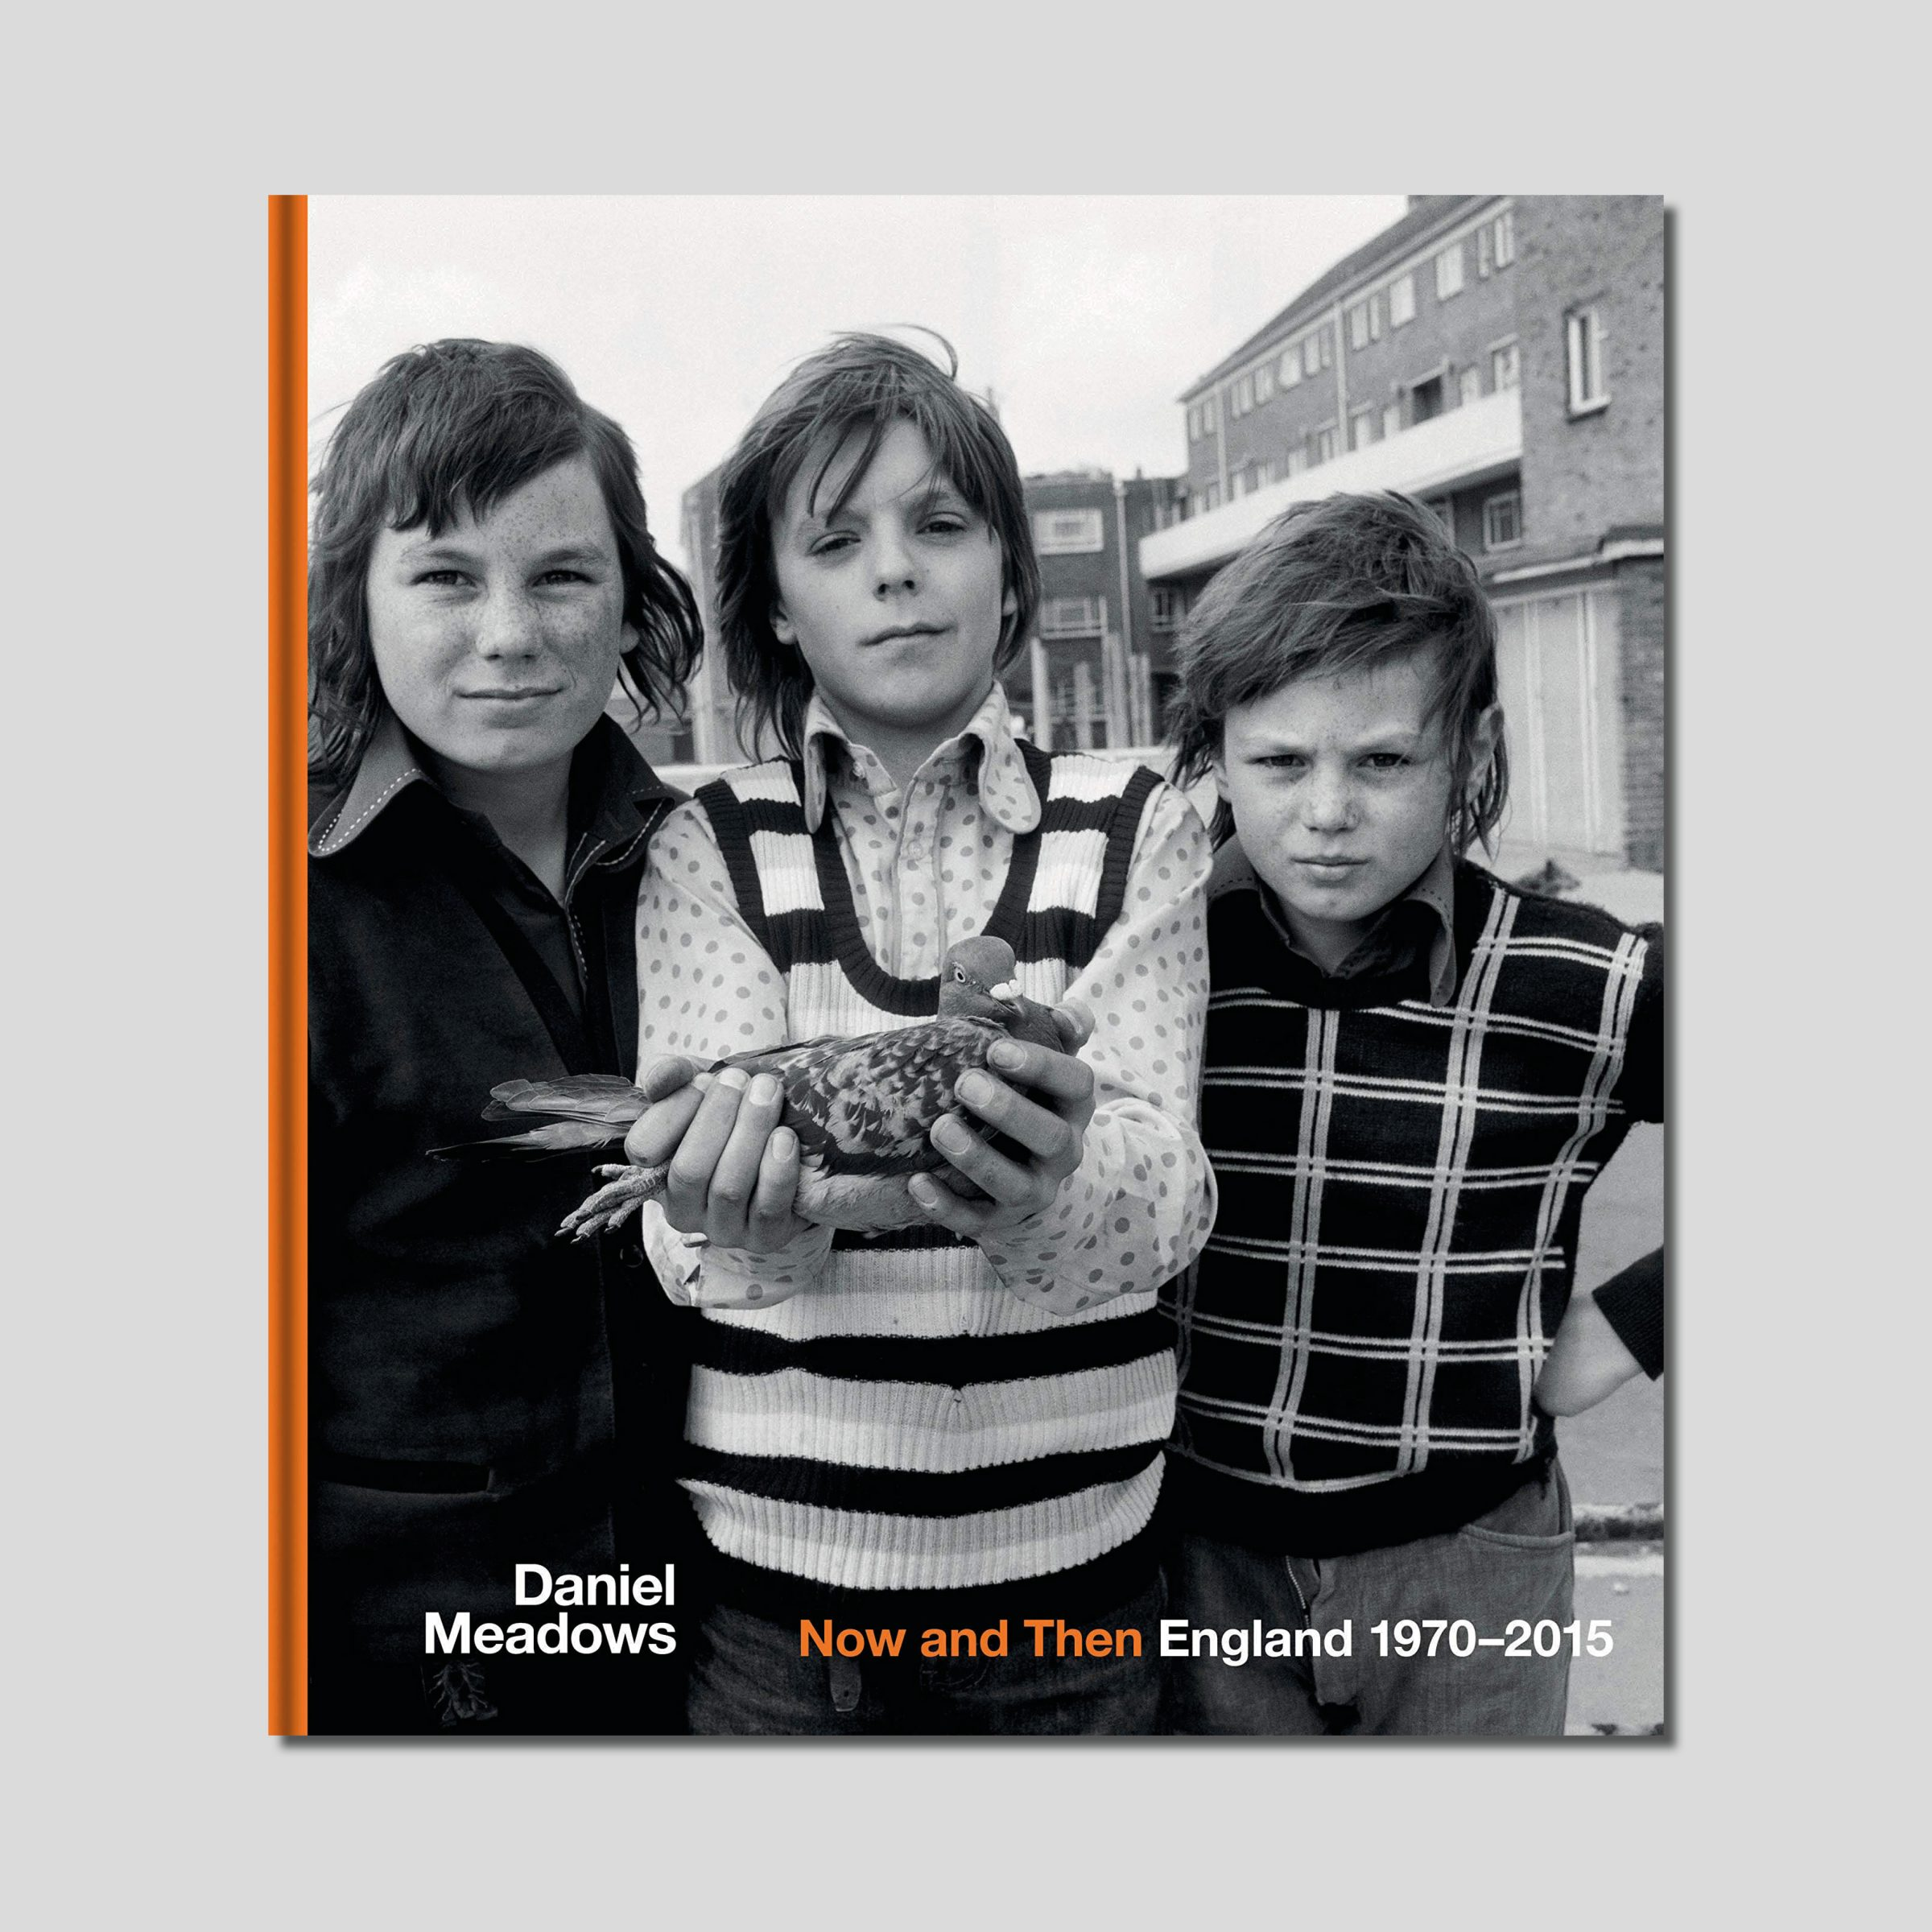 Photobook of Daniel Medows Now and Then: England 1970 - 2015